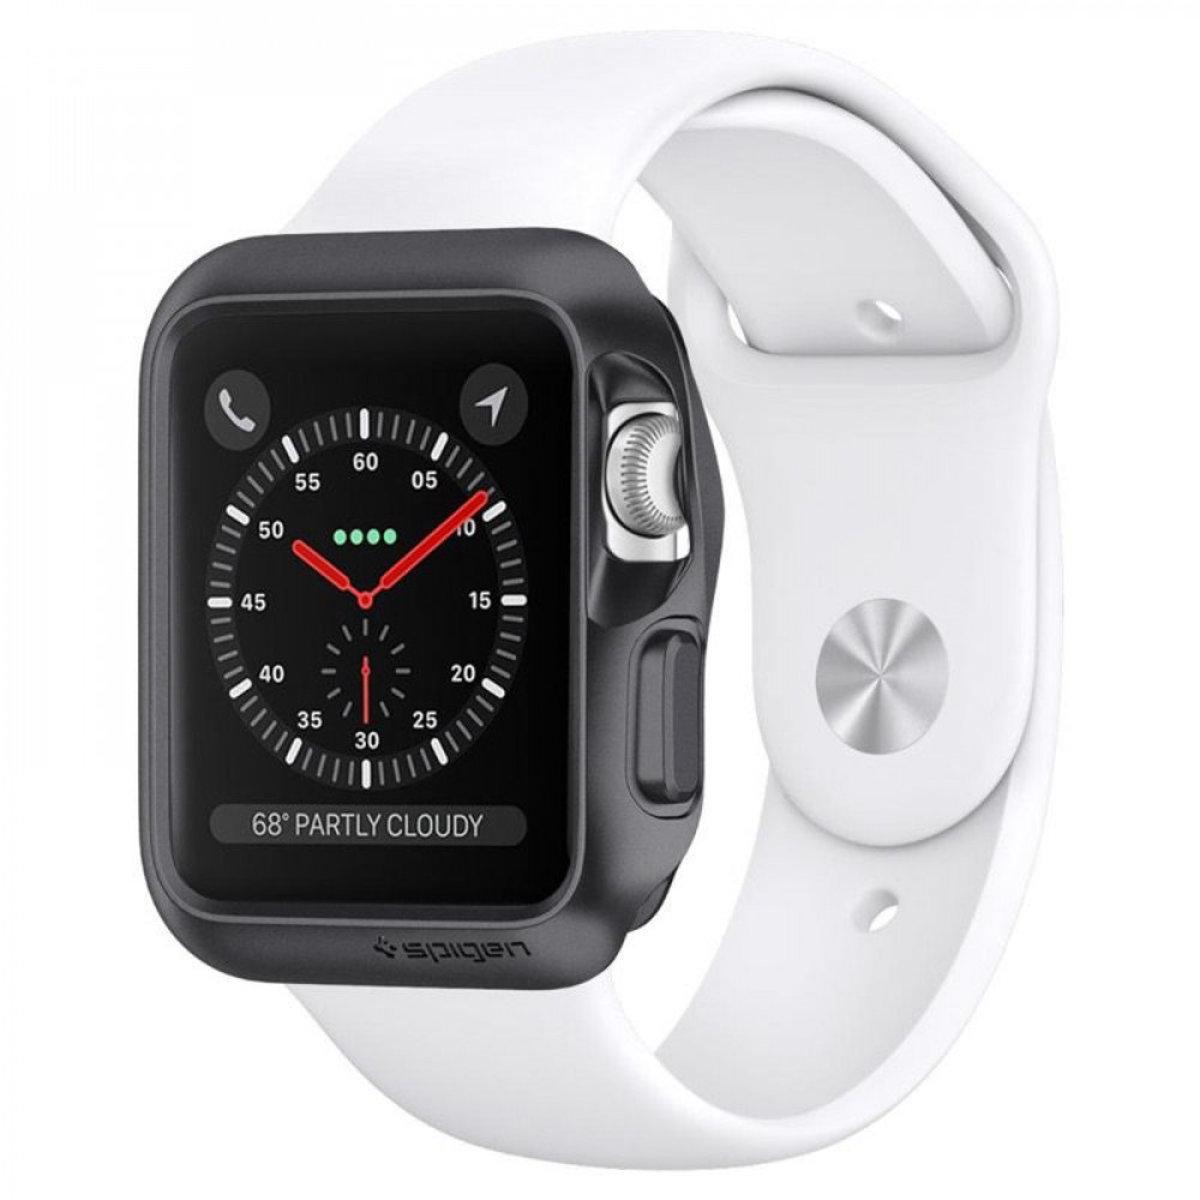 Apple Watch Series 3/2/1 (42mm) Case Slim Armor - Space Gray